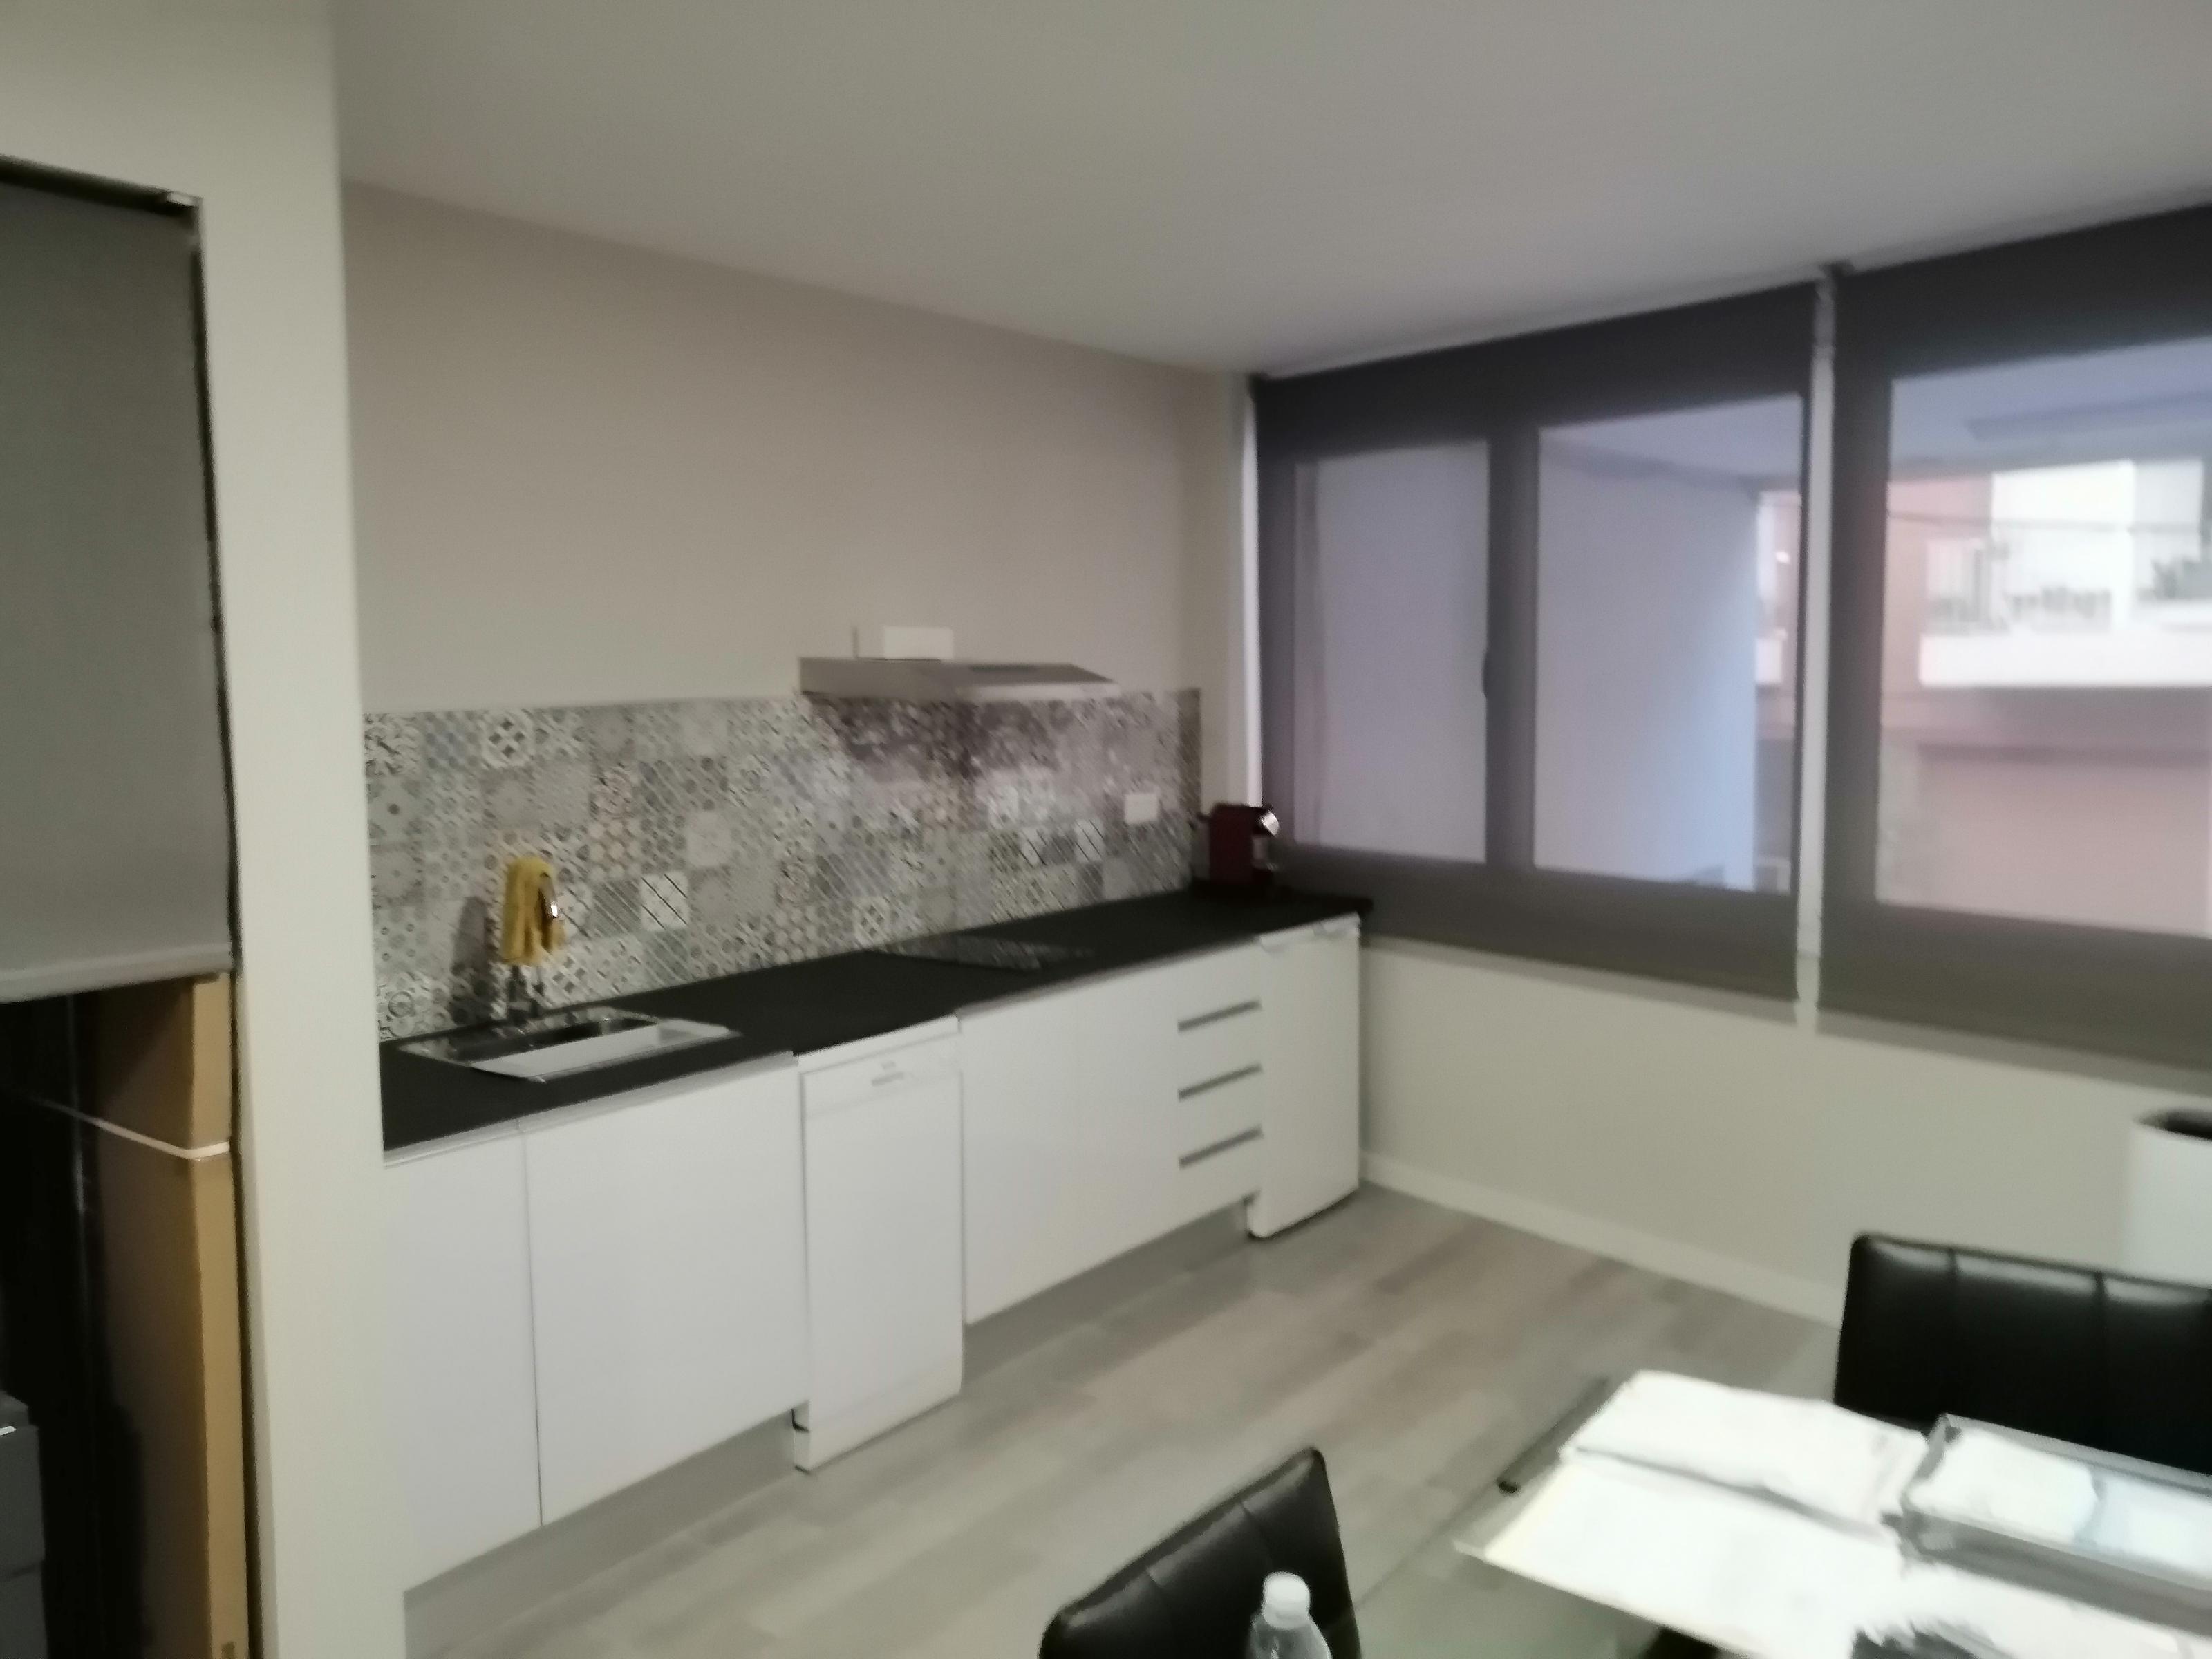 Imagen 4 Oficina Comercial en alquiler en Esplugues De Llobregat / Can Clota junto Anselmo Clave